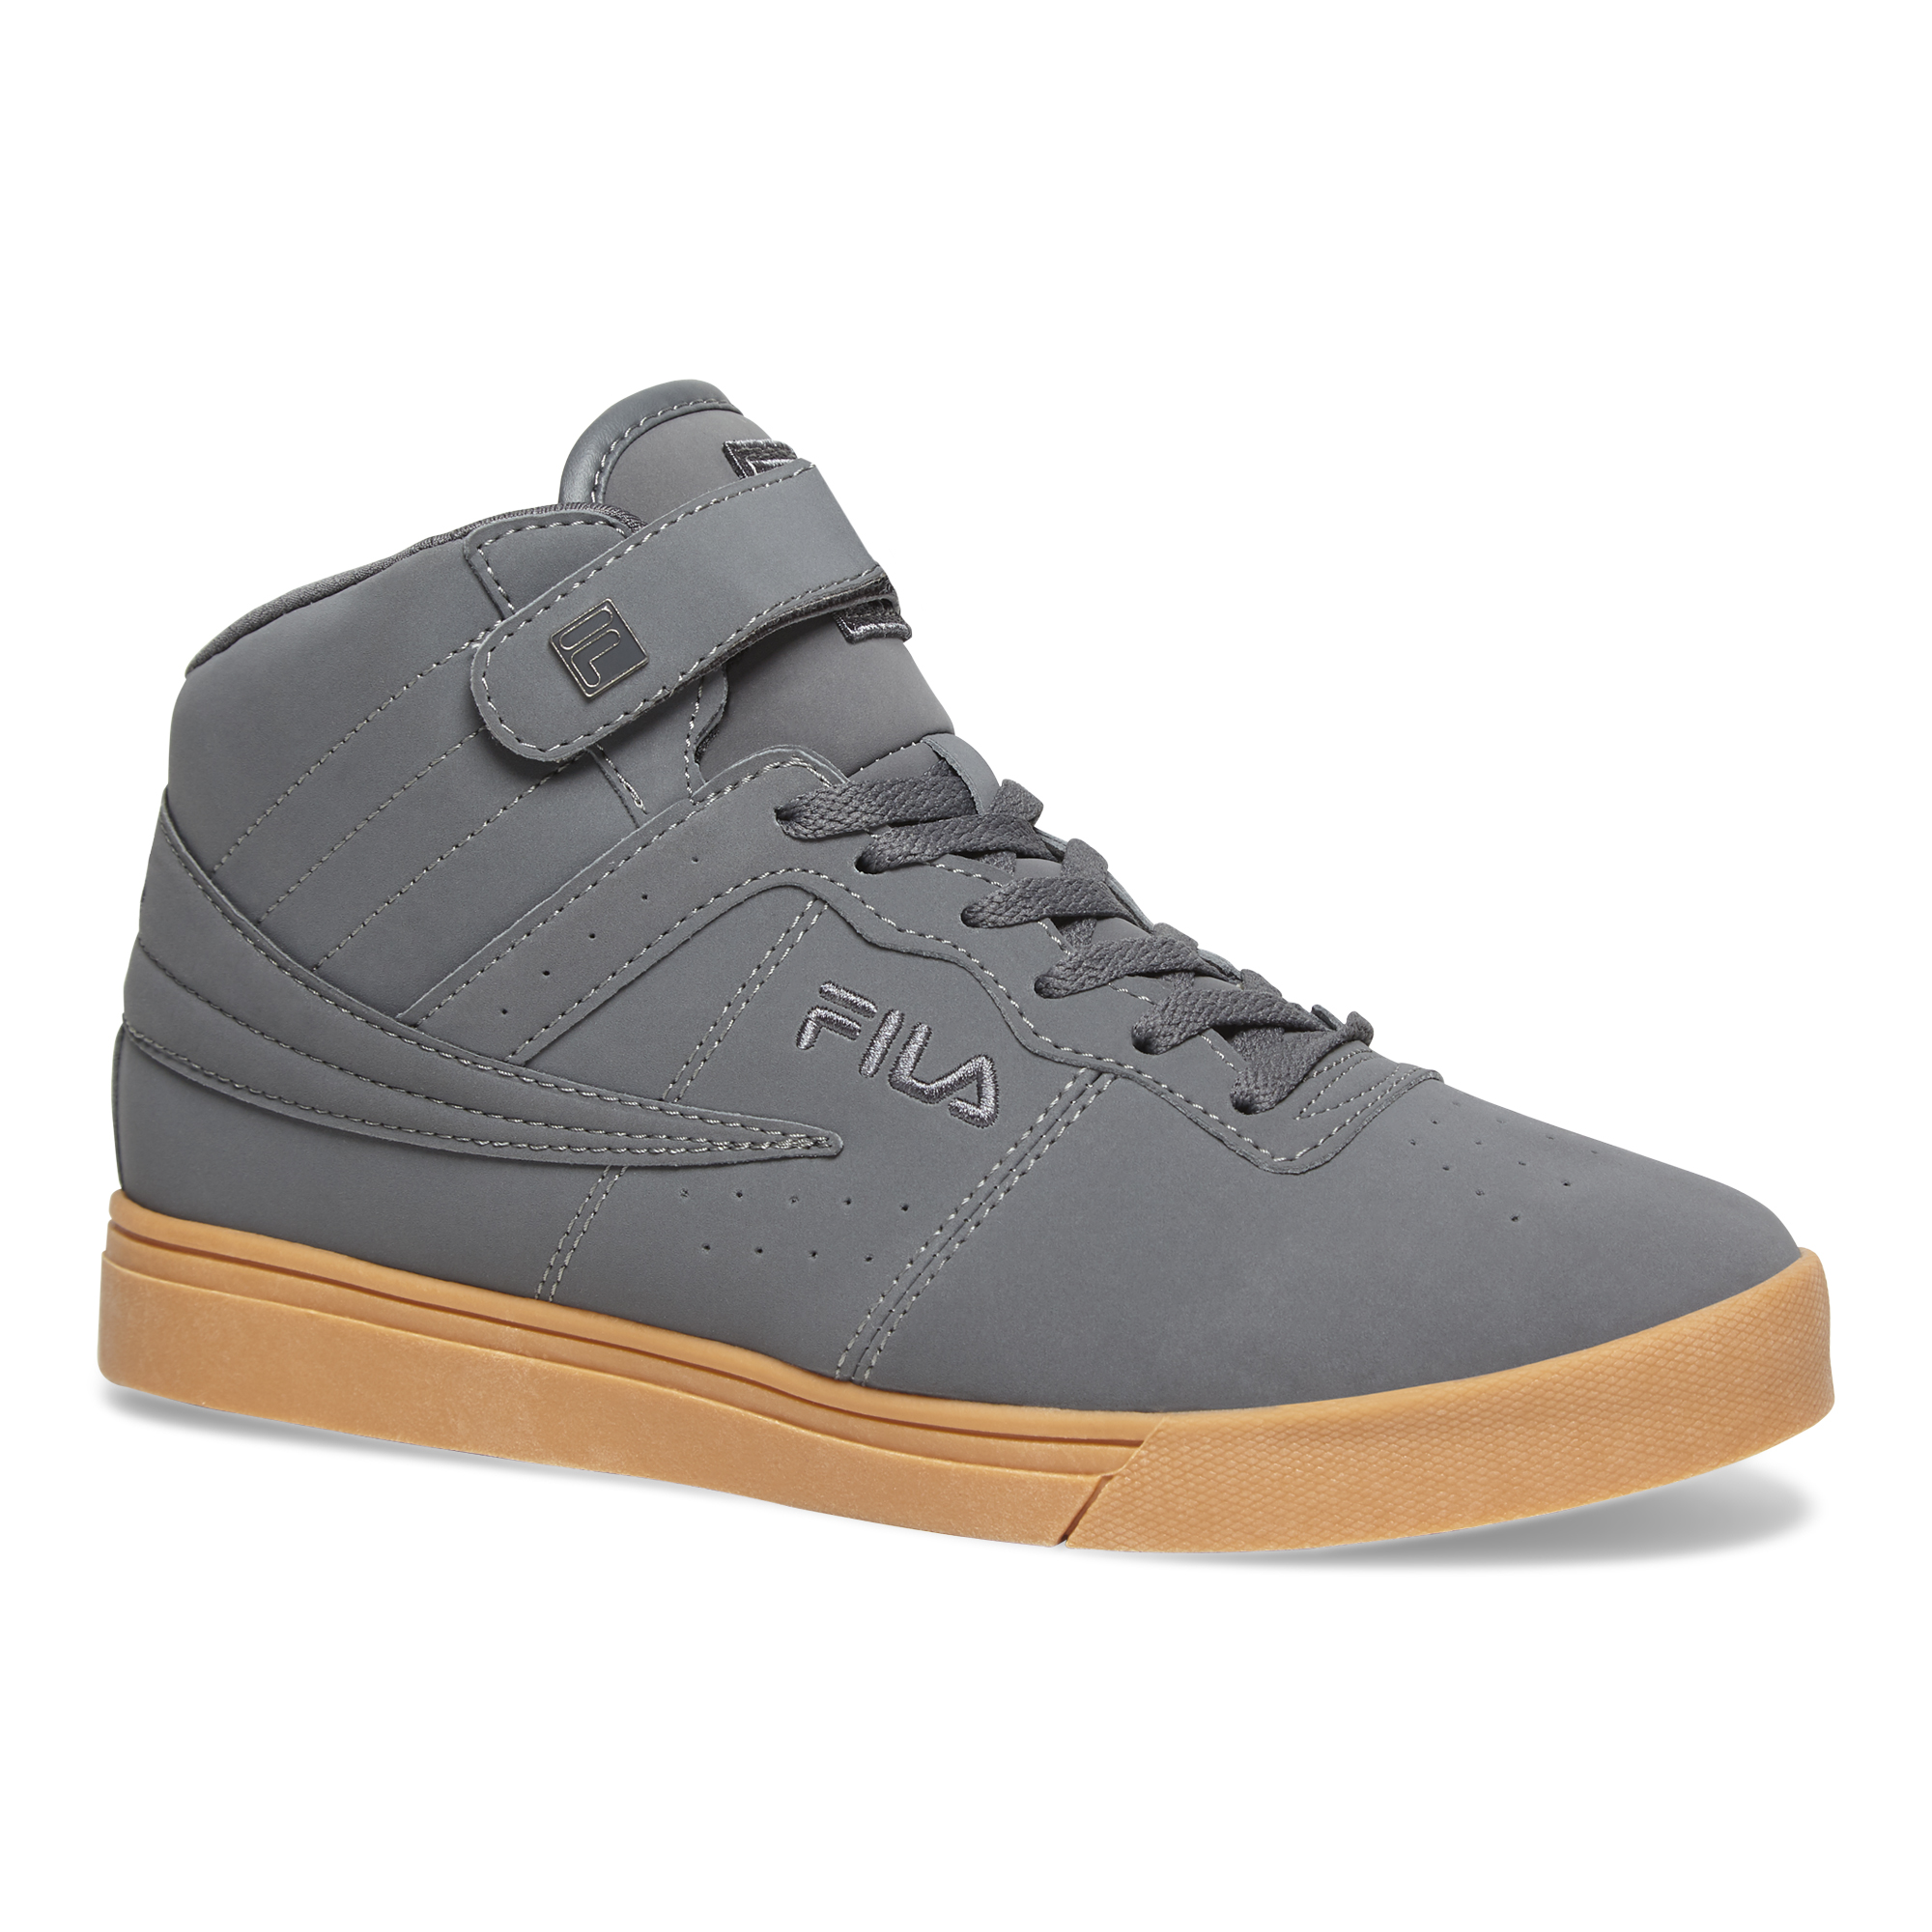 fila shoes vulc 13